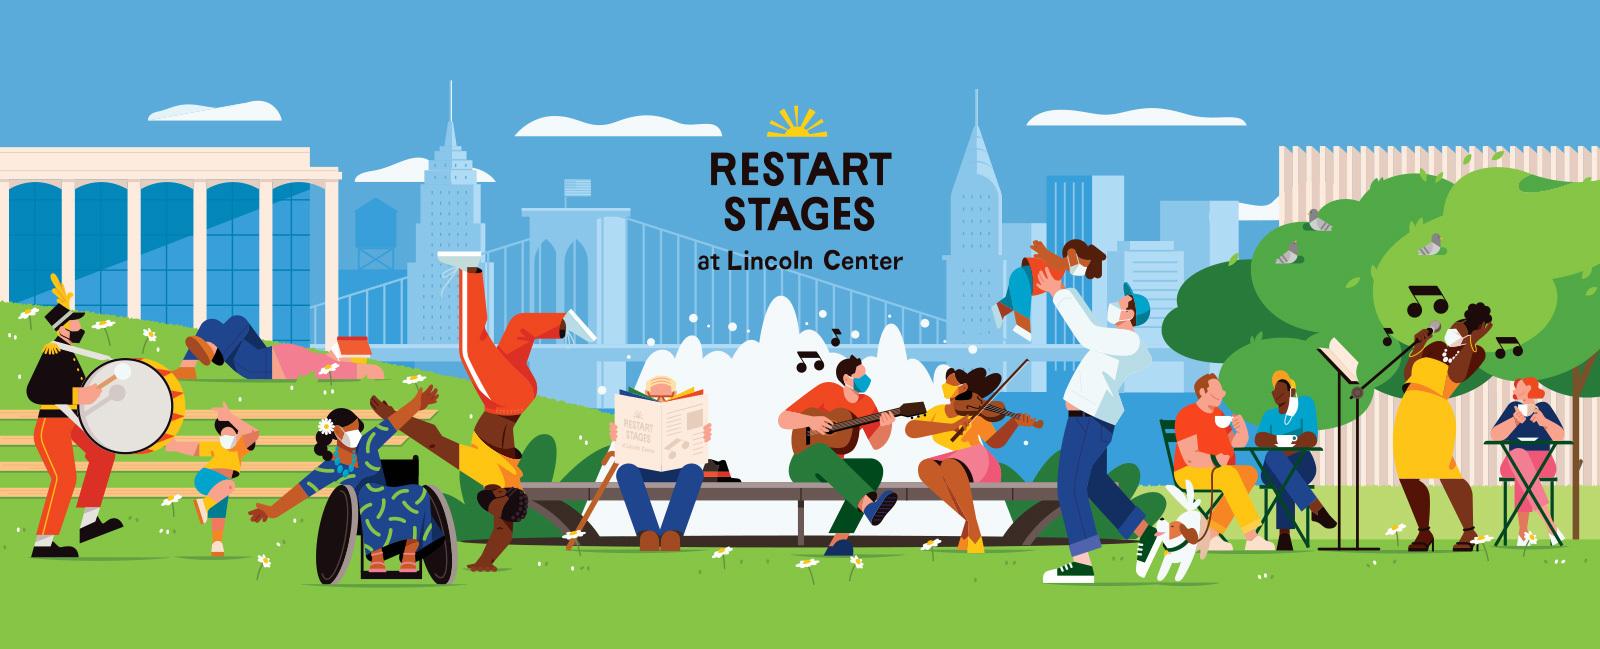 Restart Stages